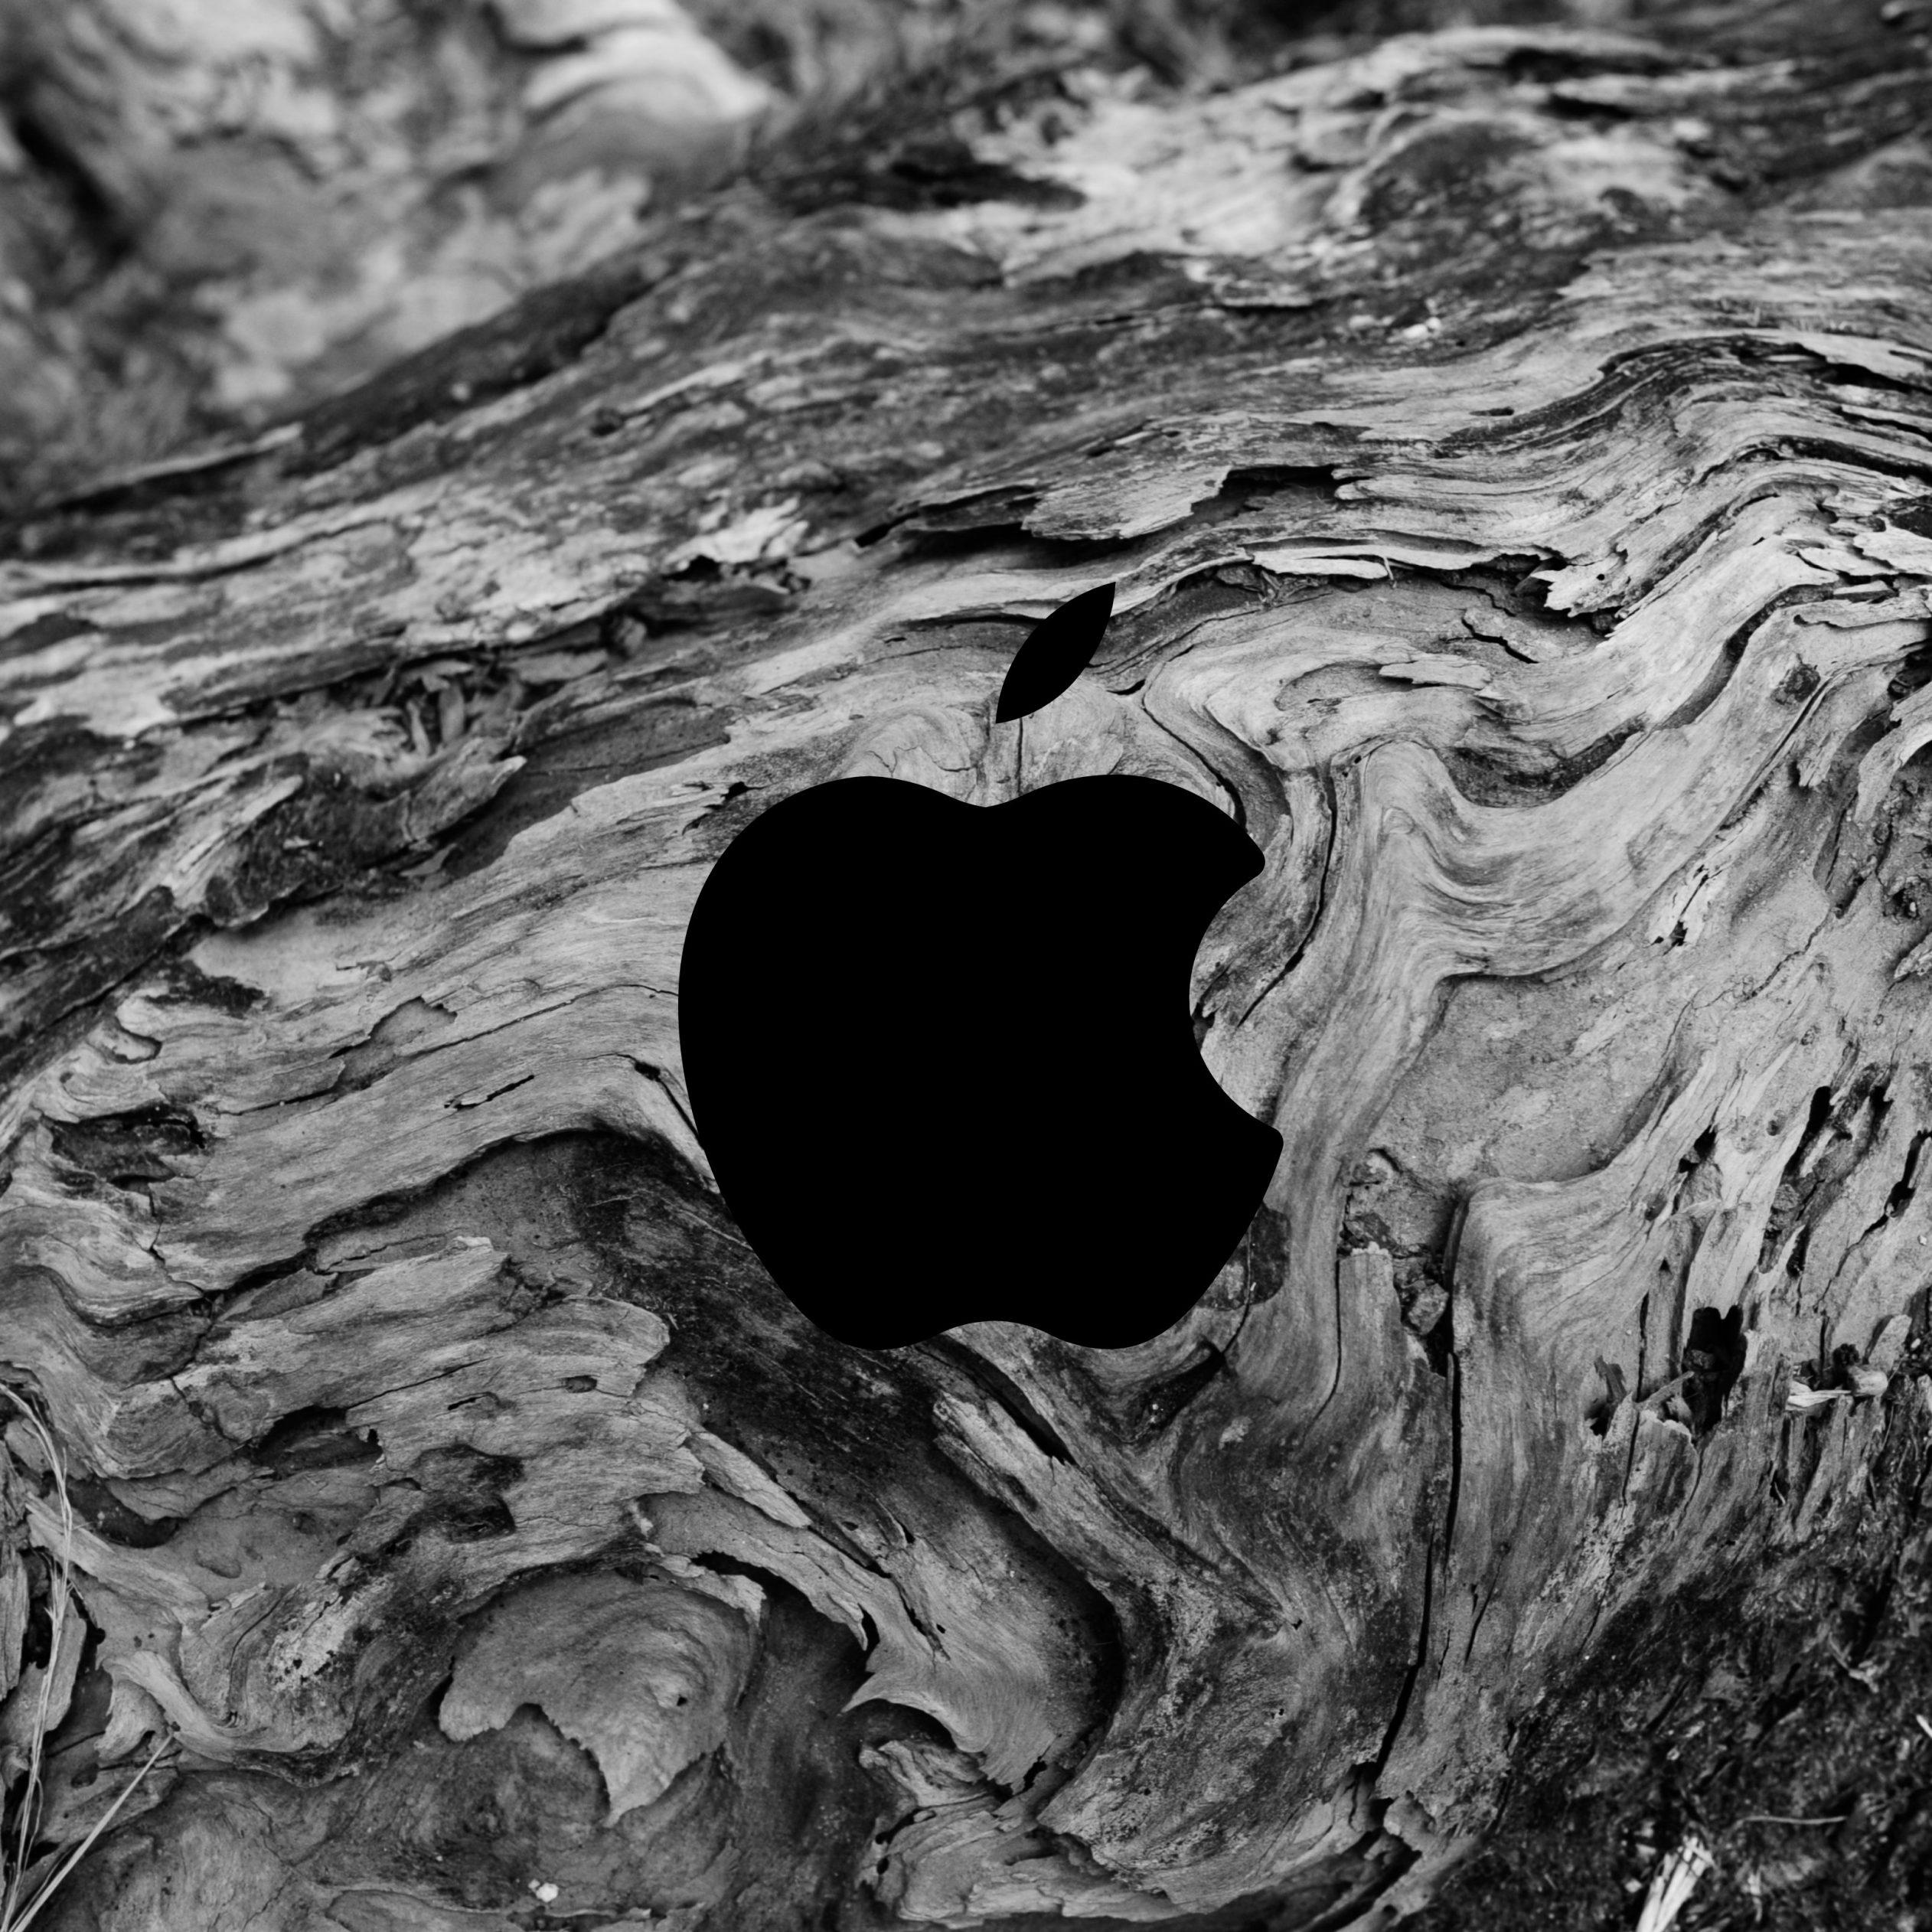 2524x2524 Parallax wallpaper 4k Apple Logo Abstract Wood Texture Pattern iPad Wallpaper 2524x2524 pixels resolution